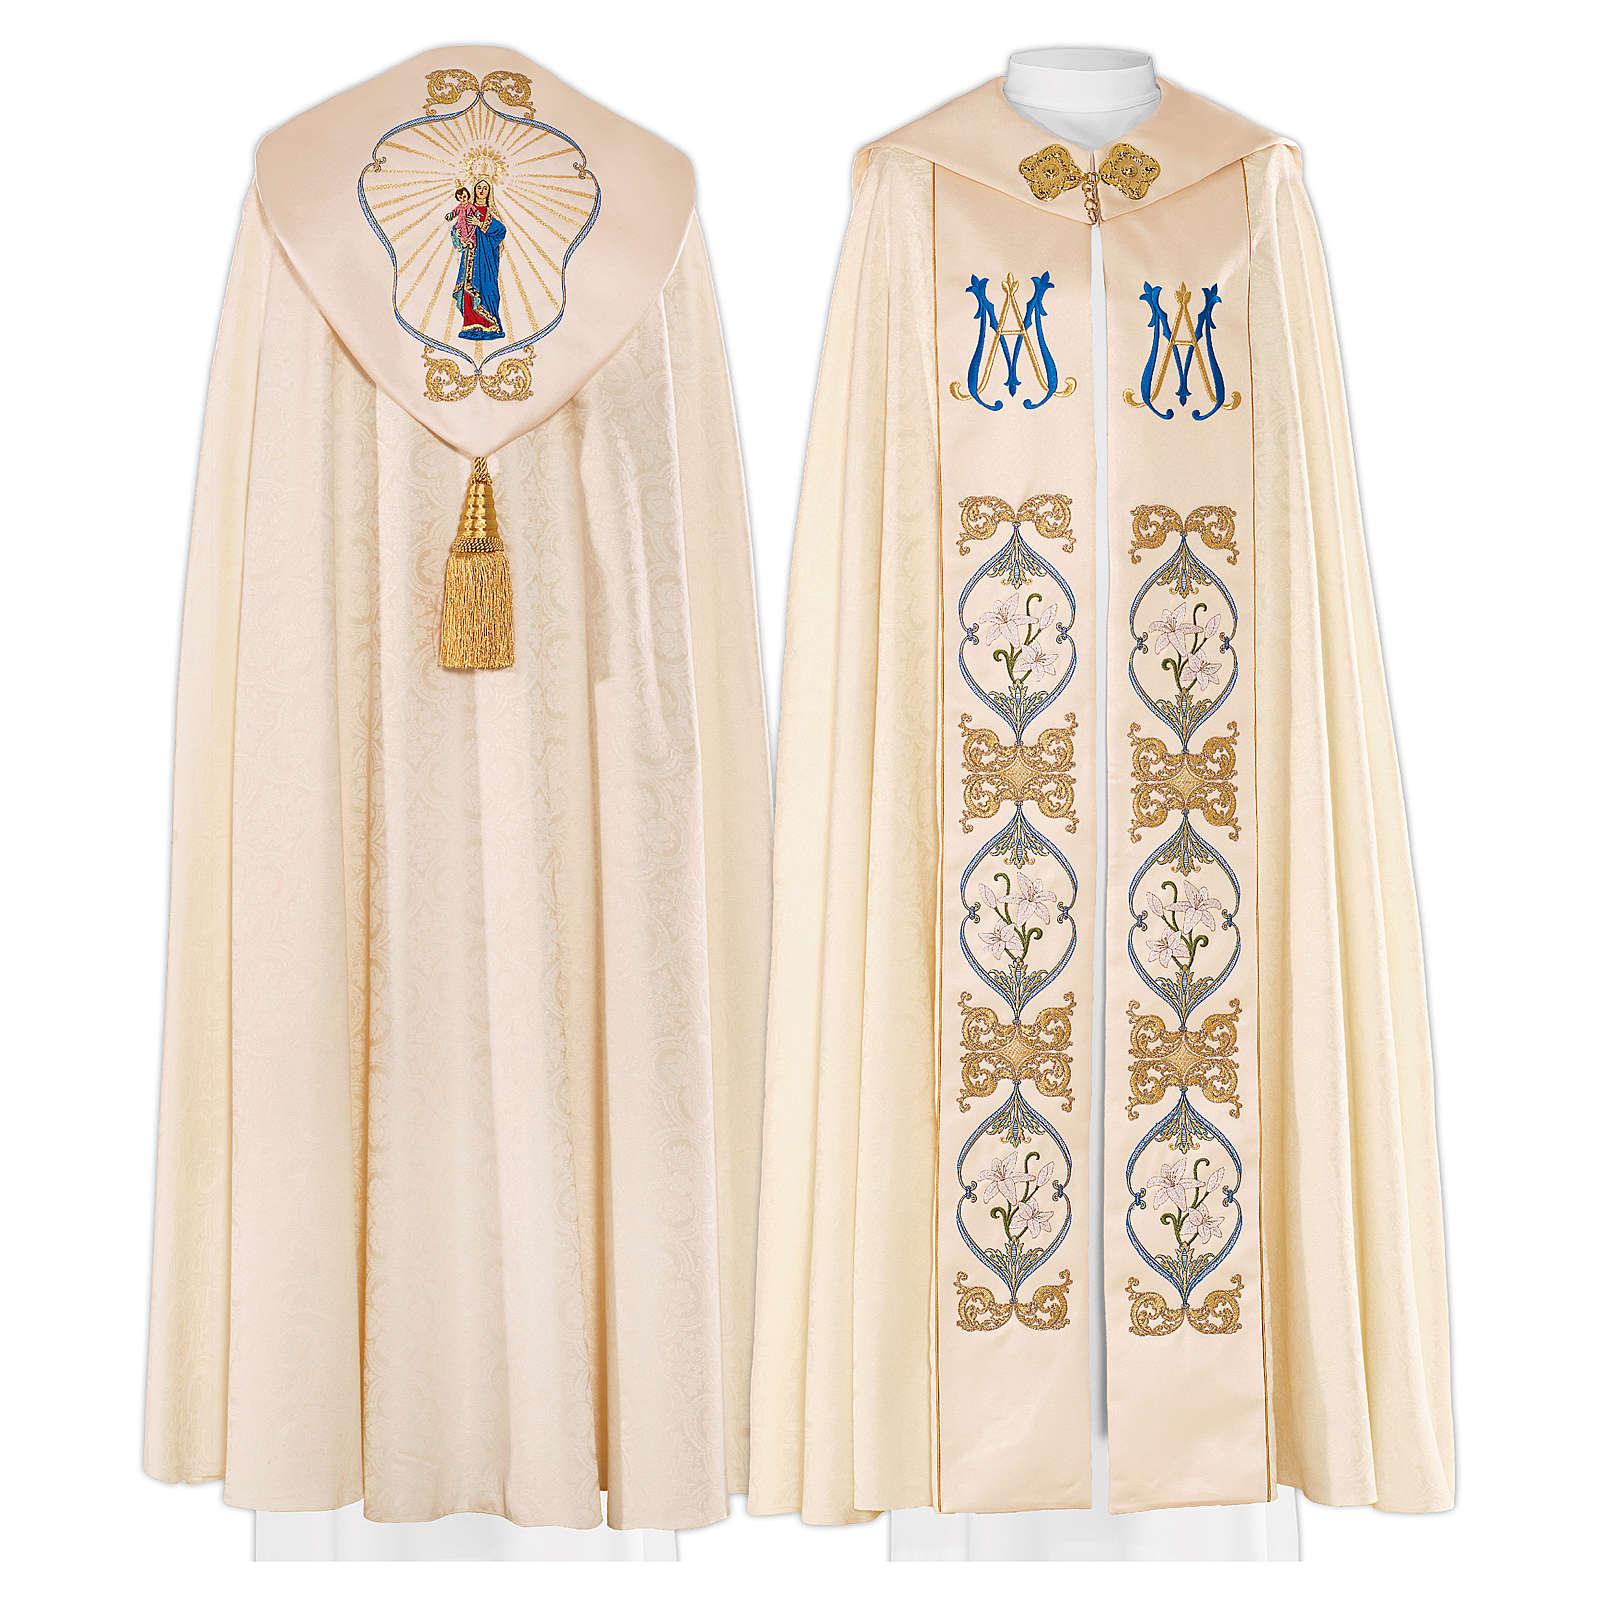 Piviale 80% poliestere bianco panna Madonna con bambino Gesù 4